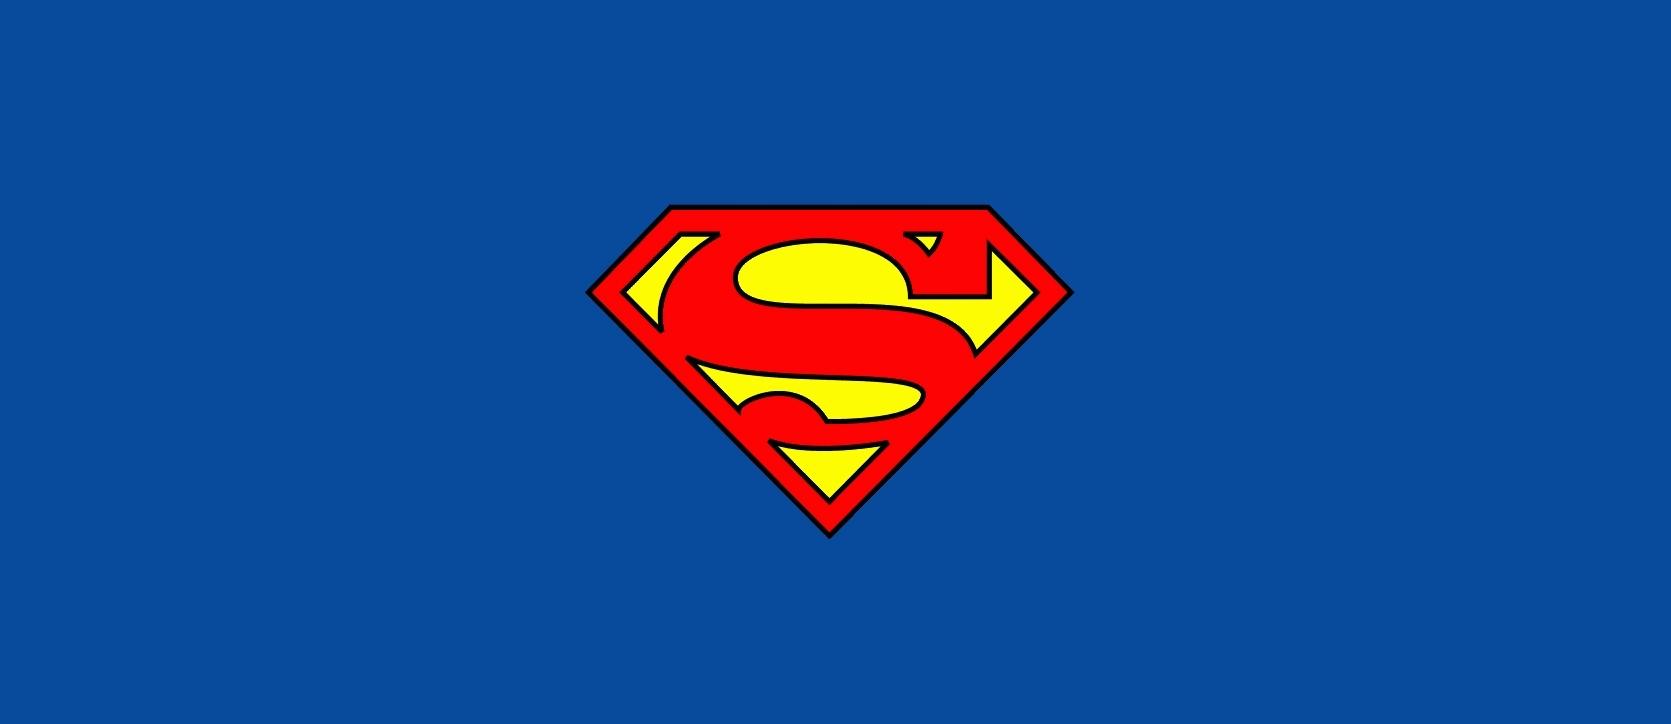 DC Comics Declines to Allow Superman Logo on Memorial for Slain Child 1671x724